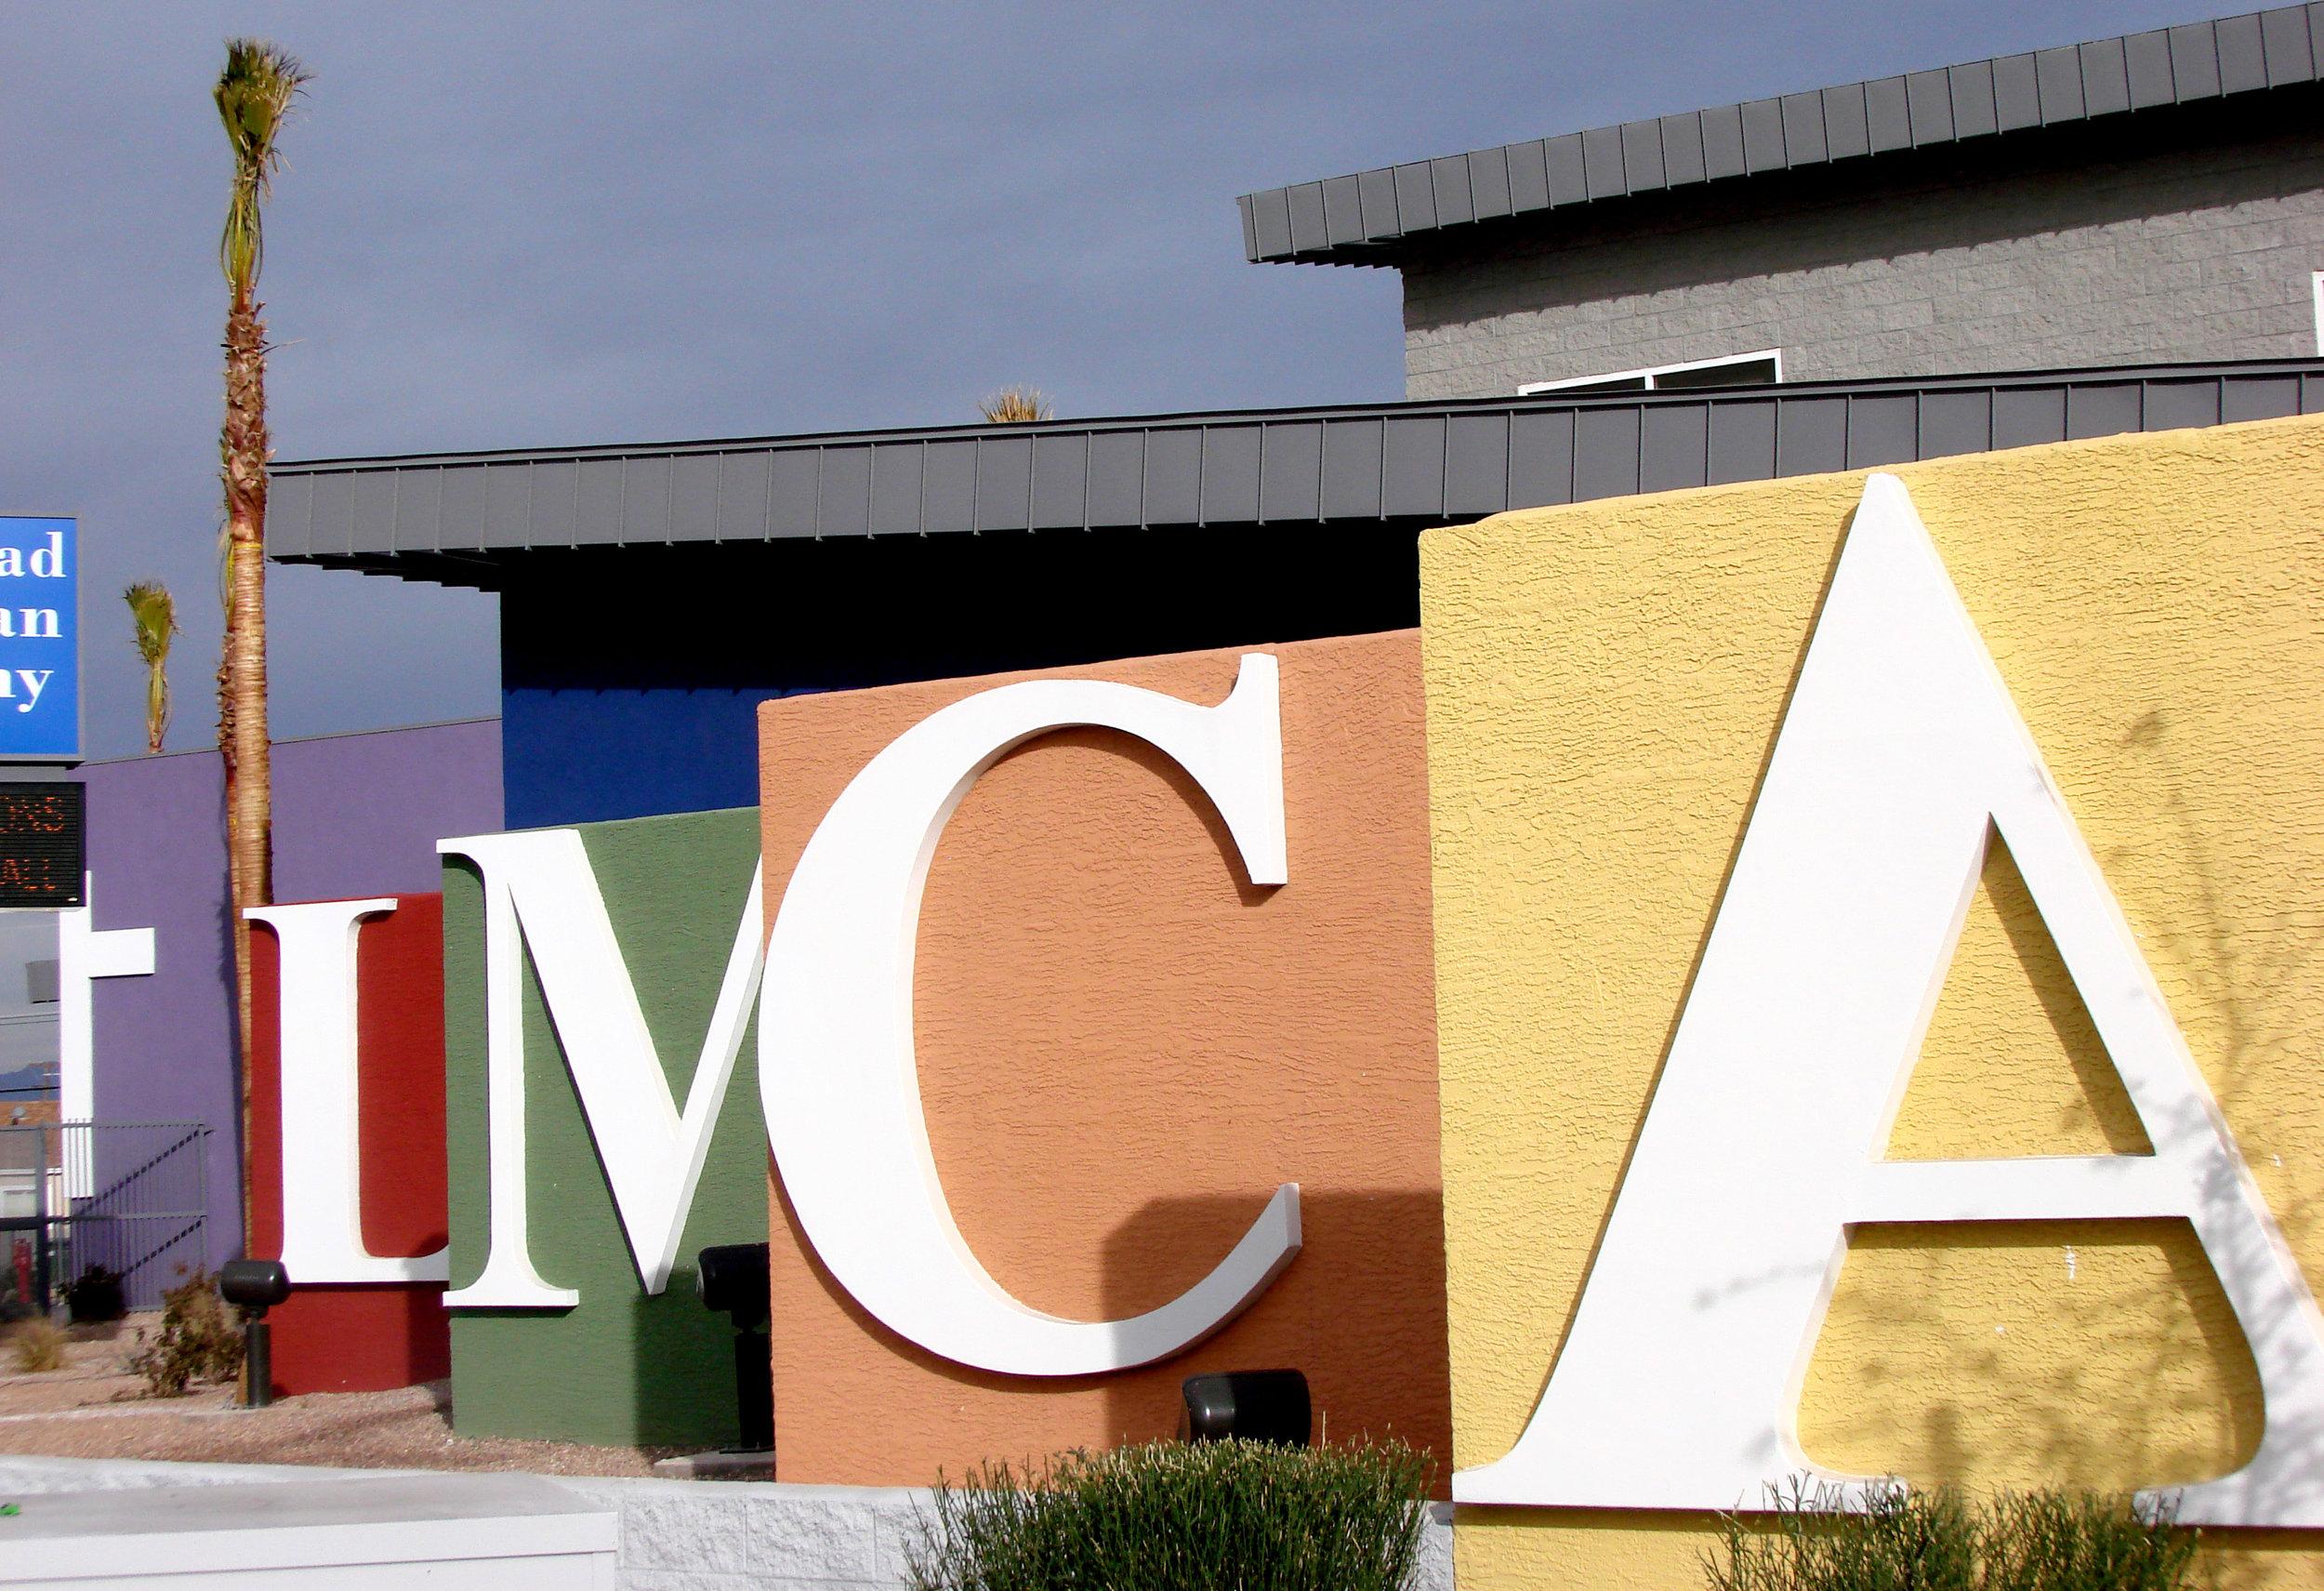 LMCA01.jpg